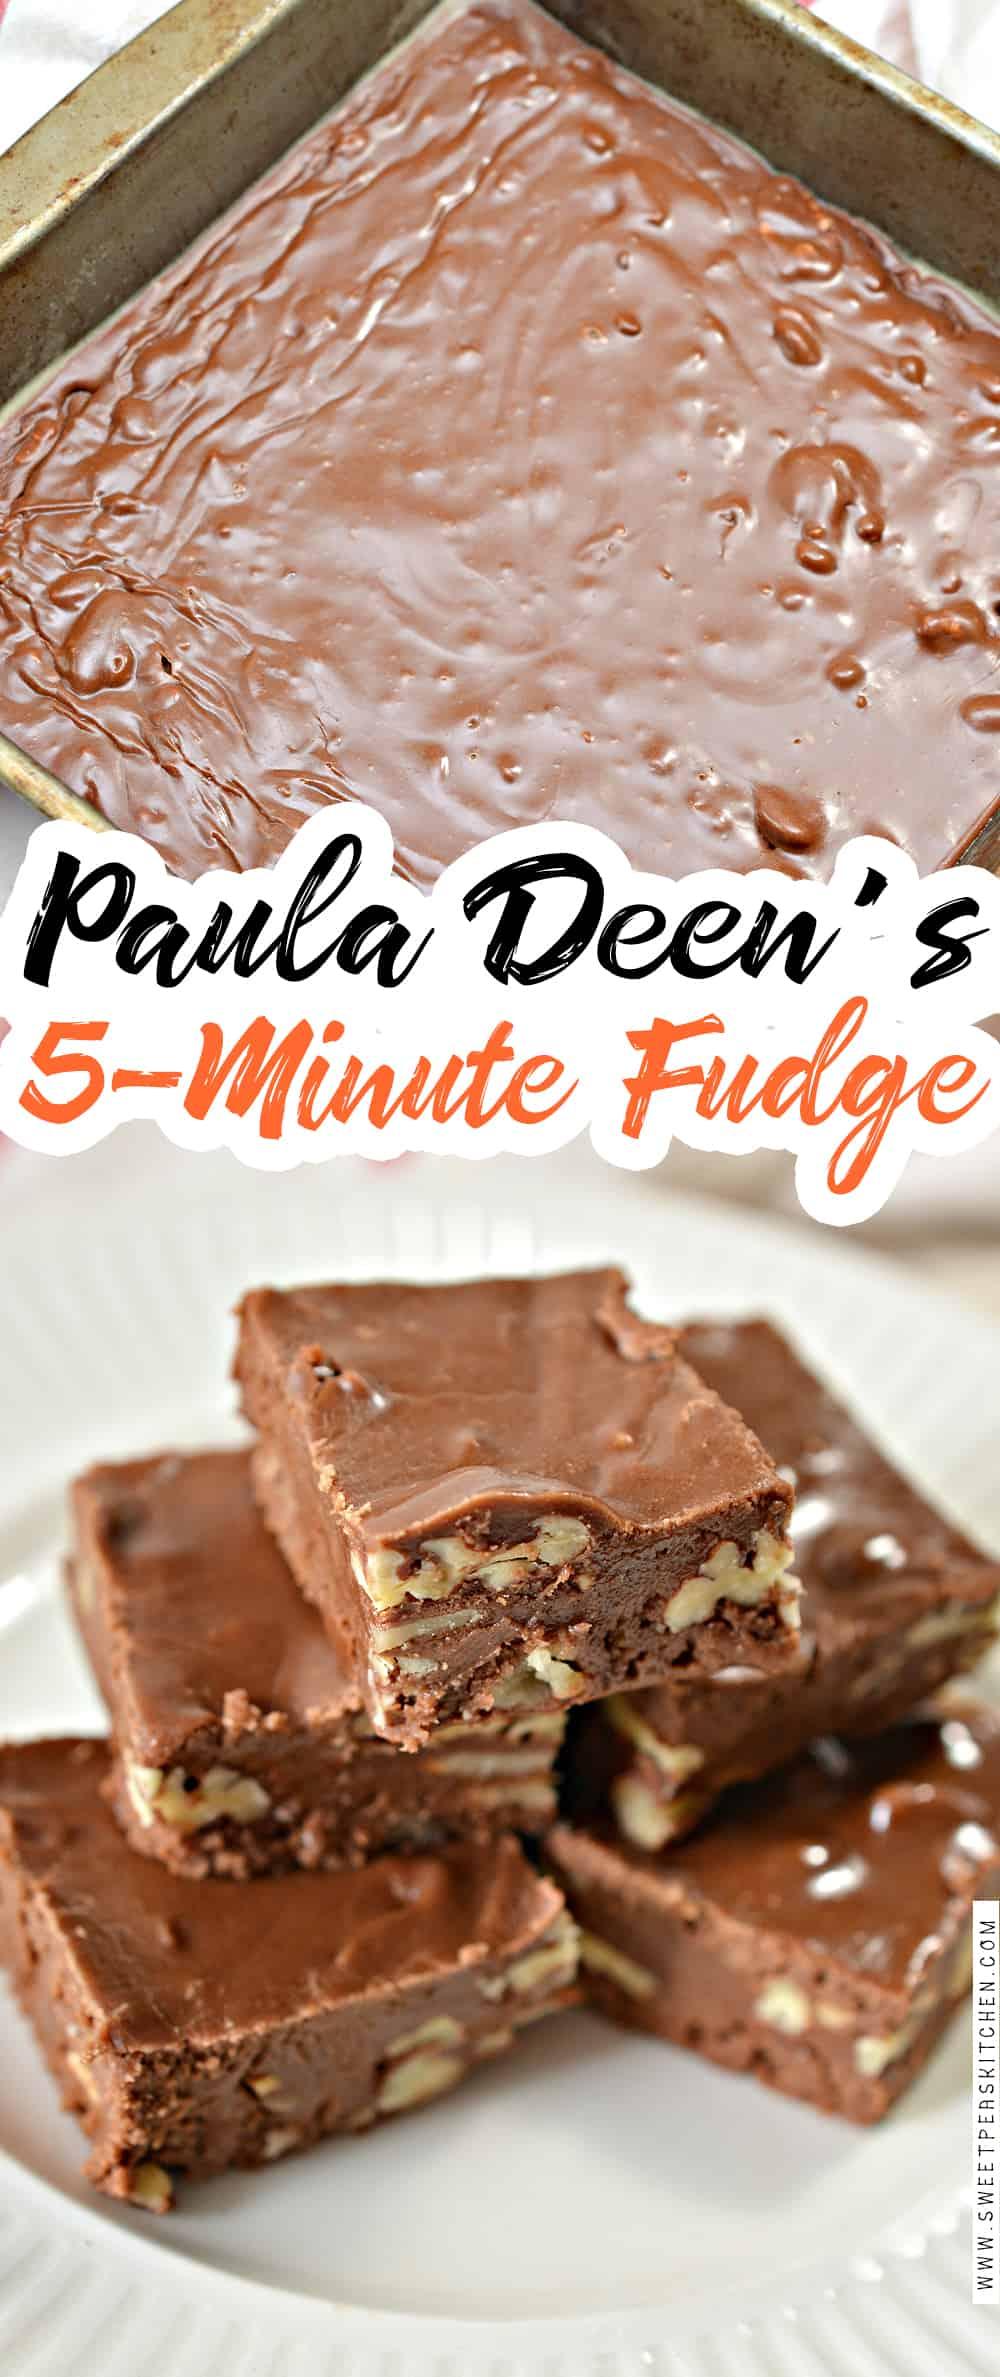 Paula Deen's 5-Minute Fudge